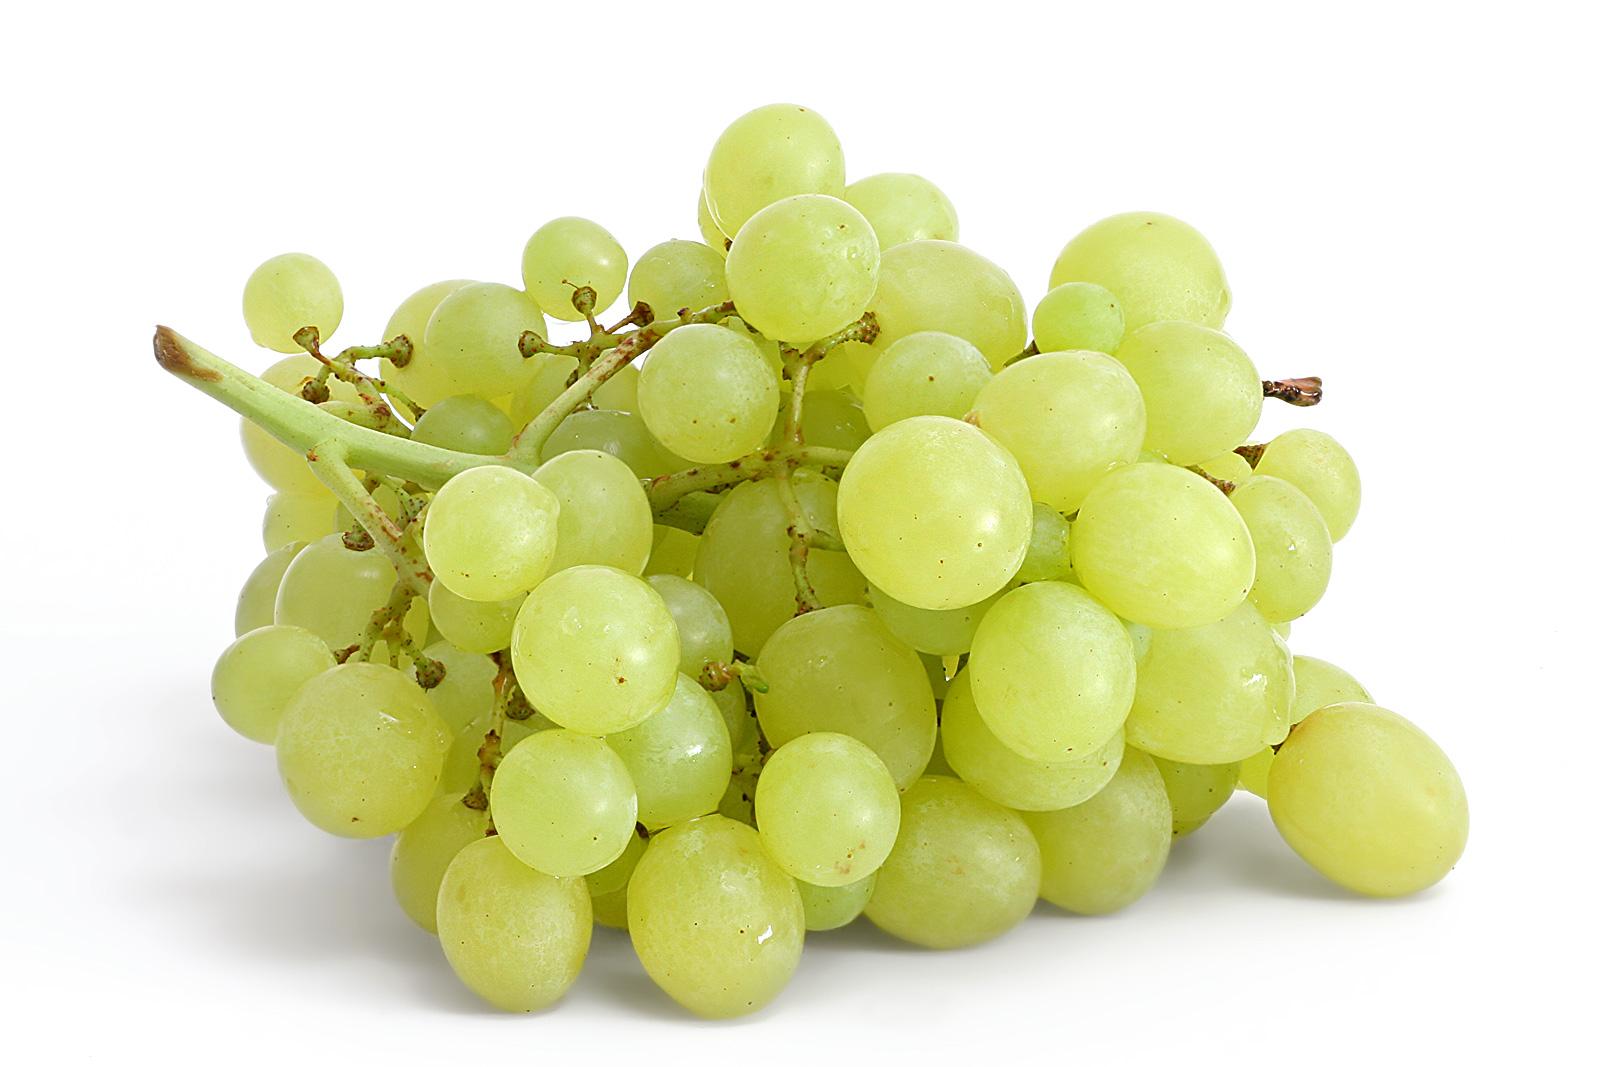 Green grape องุ่นเขียว